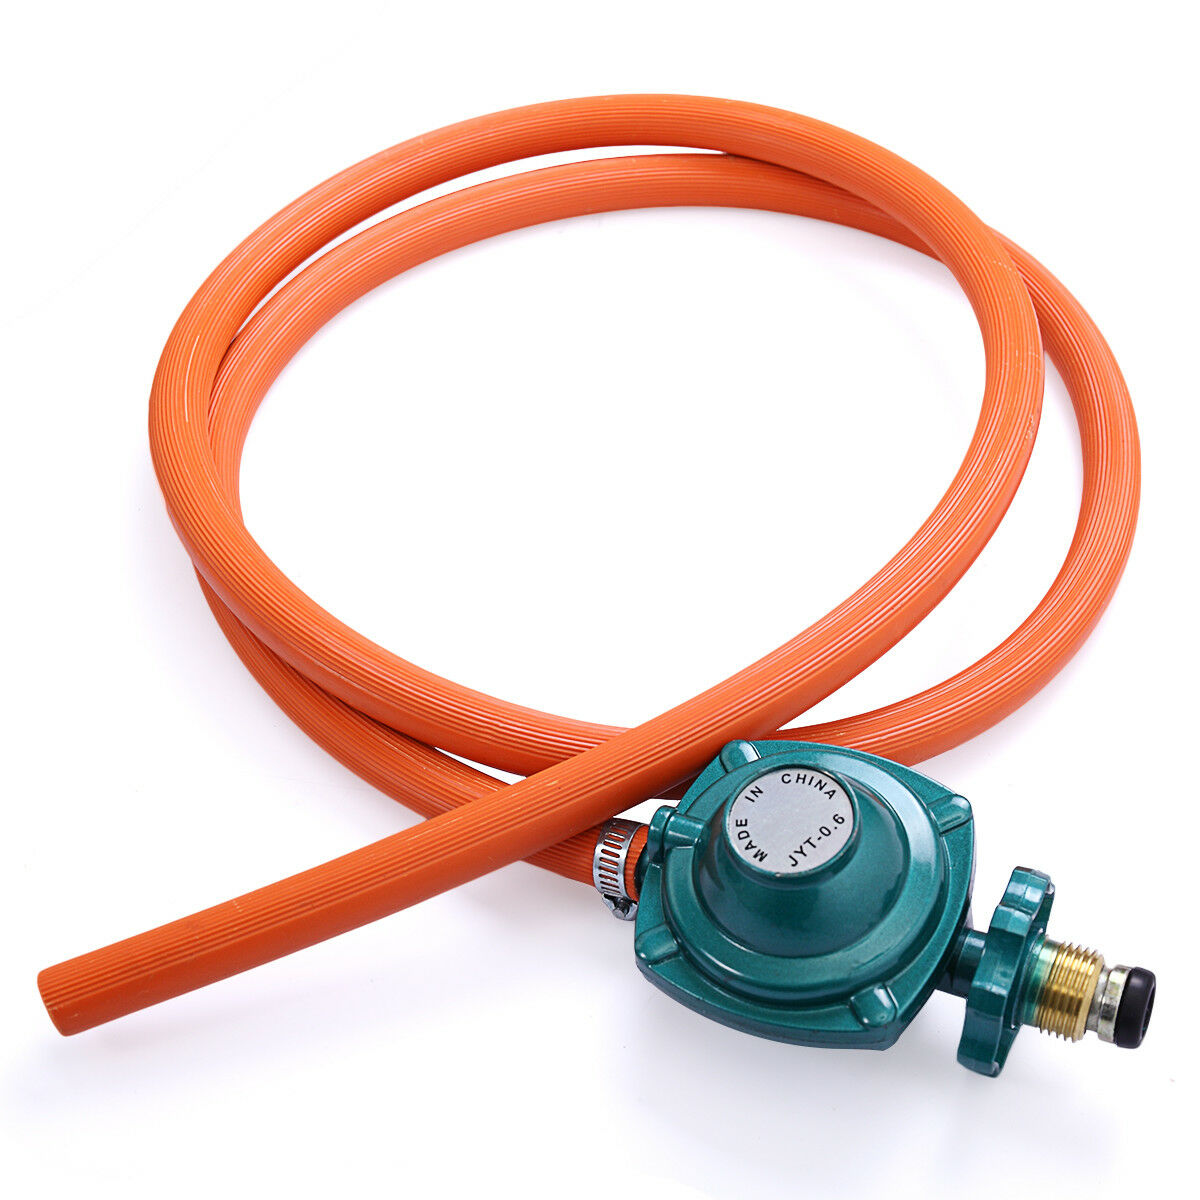 Single Burner Gas Stove Hose Included